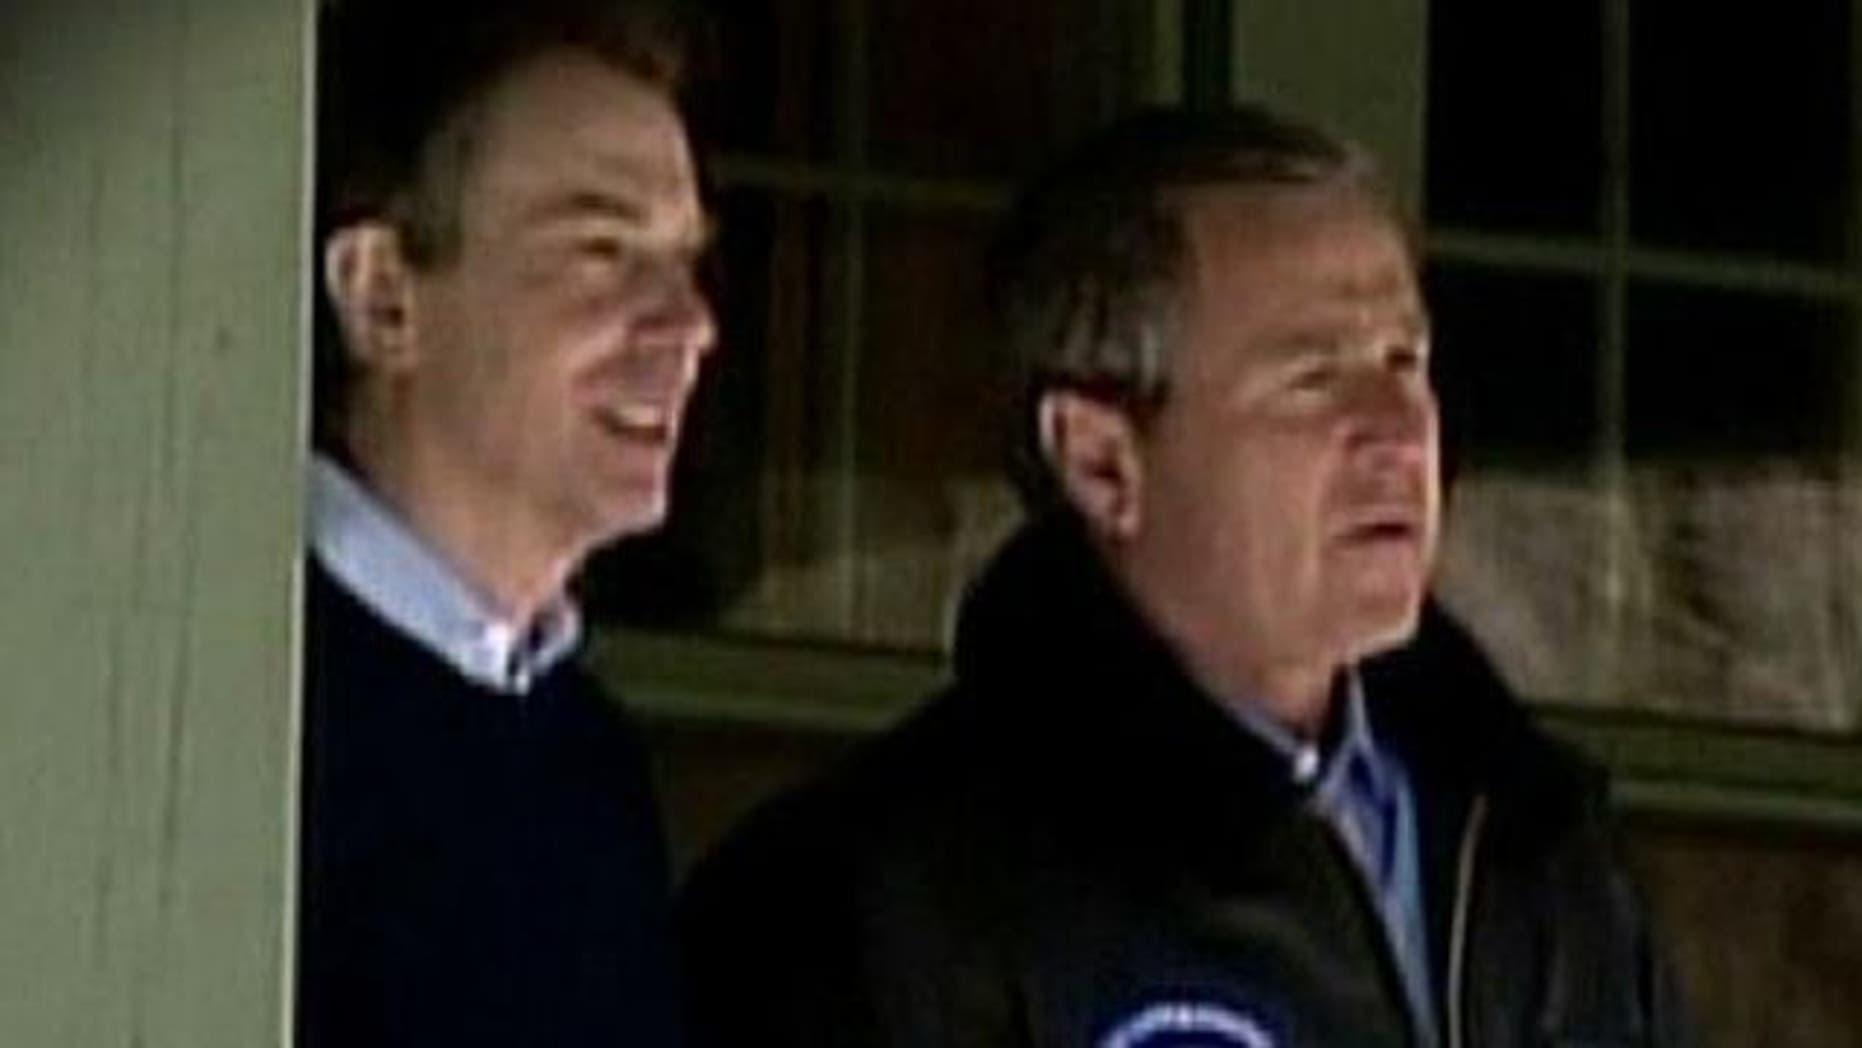 Former British Prime Minister Tony Blair and Former U.S. President George W. Bush